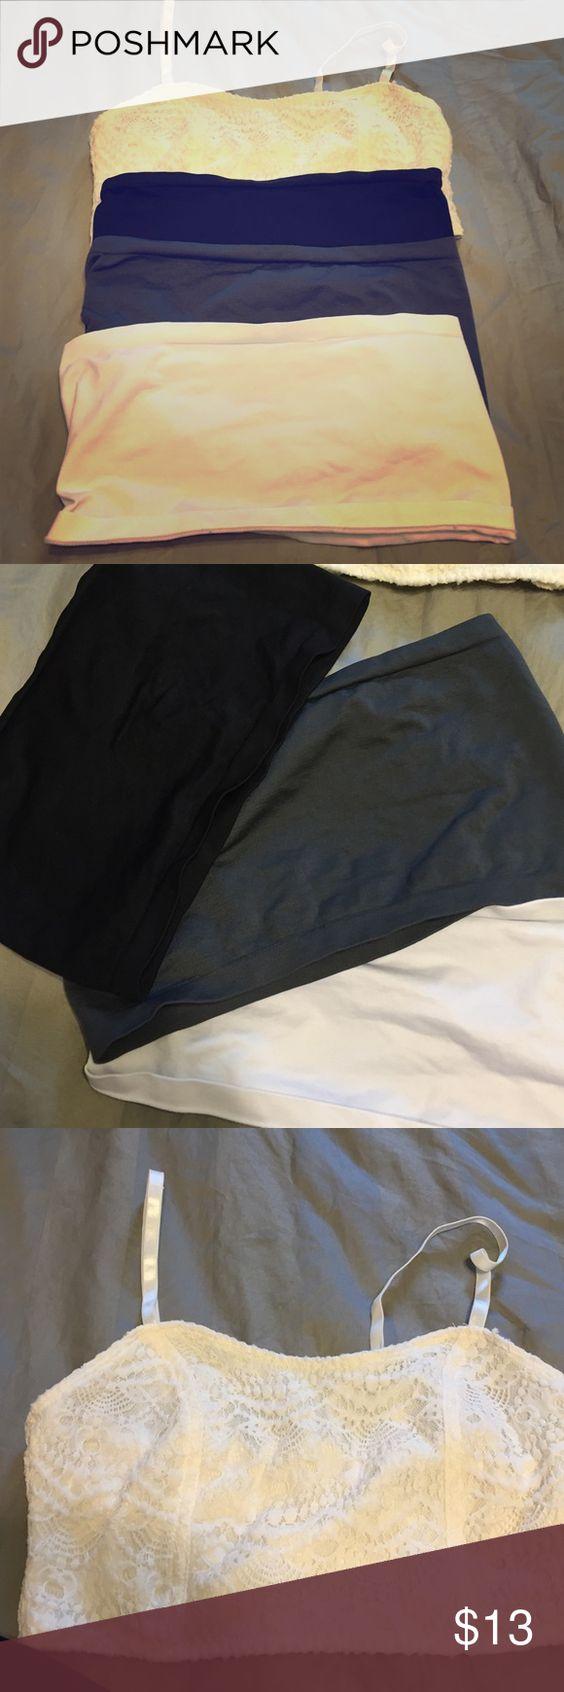 4 bandeaus 1 zip up cream color, 1 black, 1 grey, & 1 white Tops Camisoles